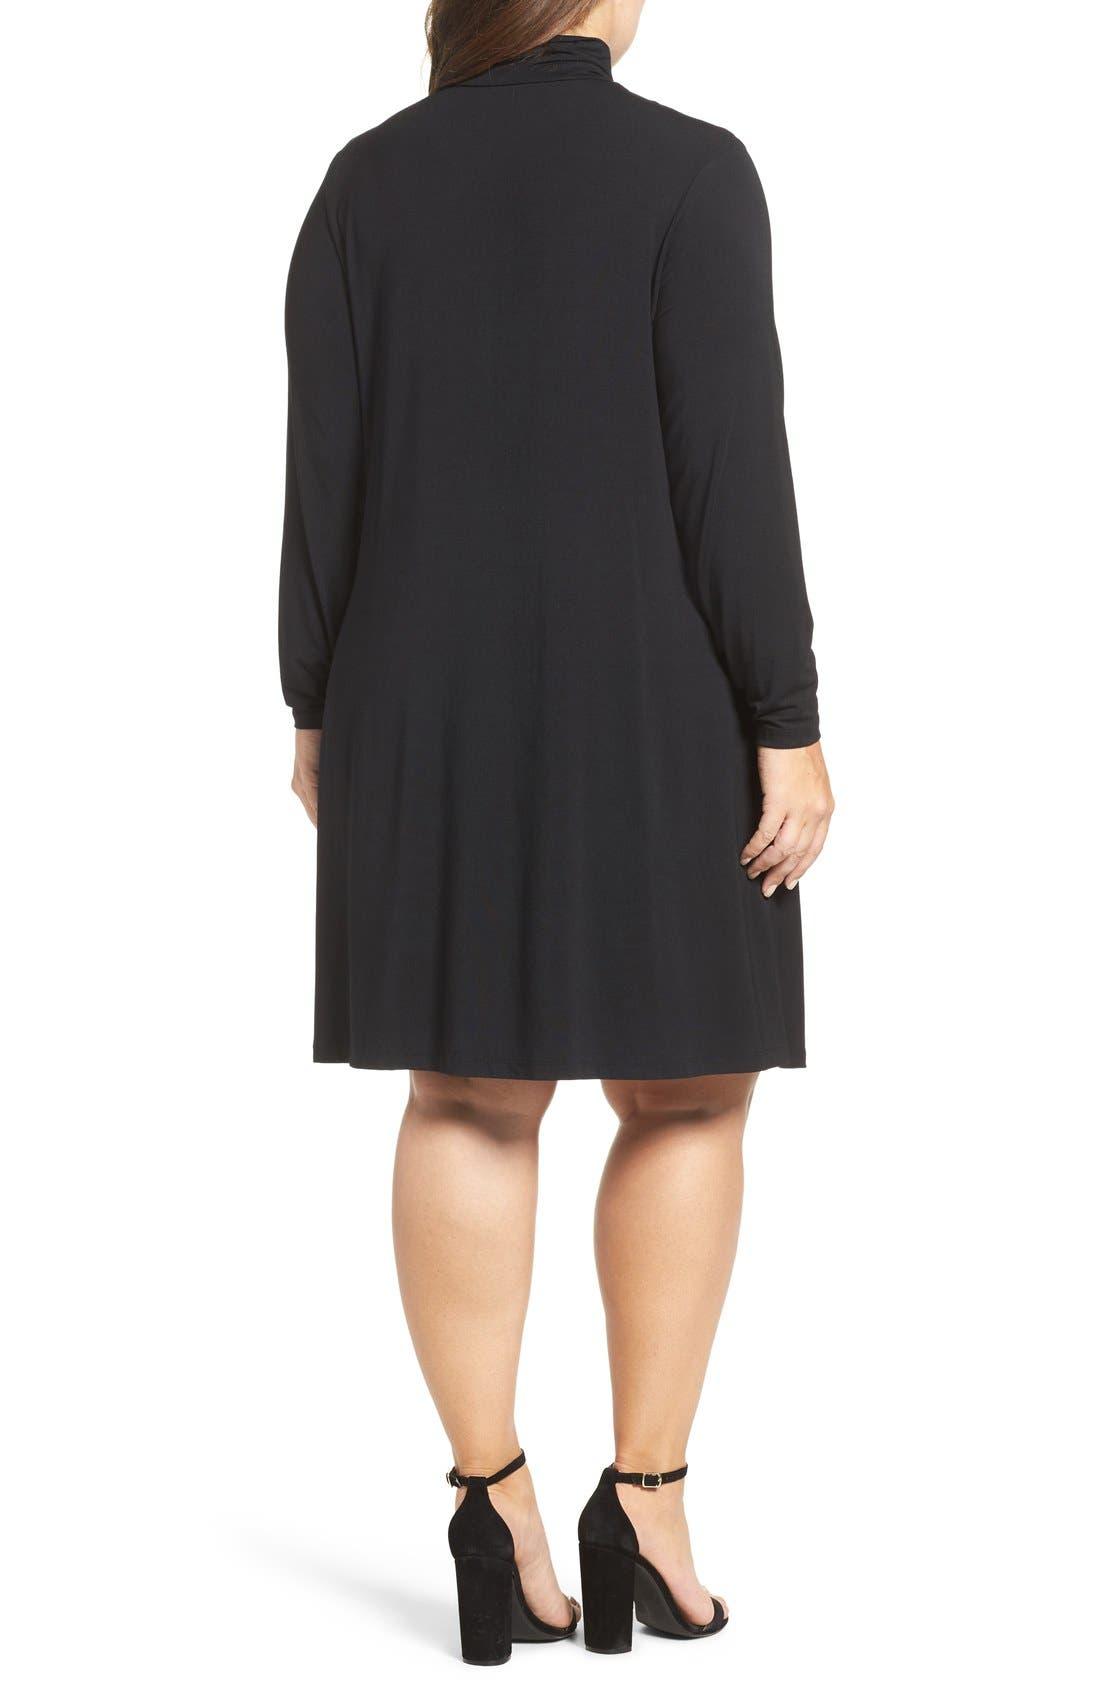 Sally Turtleneck A-Line Dress,                             Alternate thumbnail 7, color,                             001